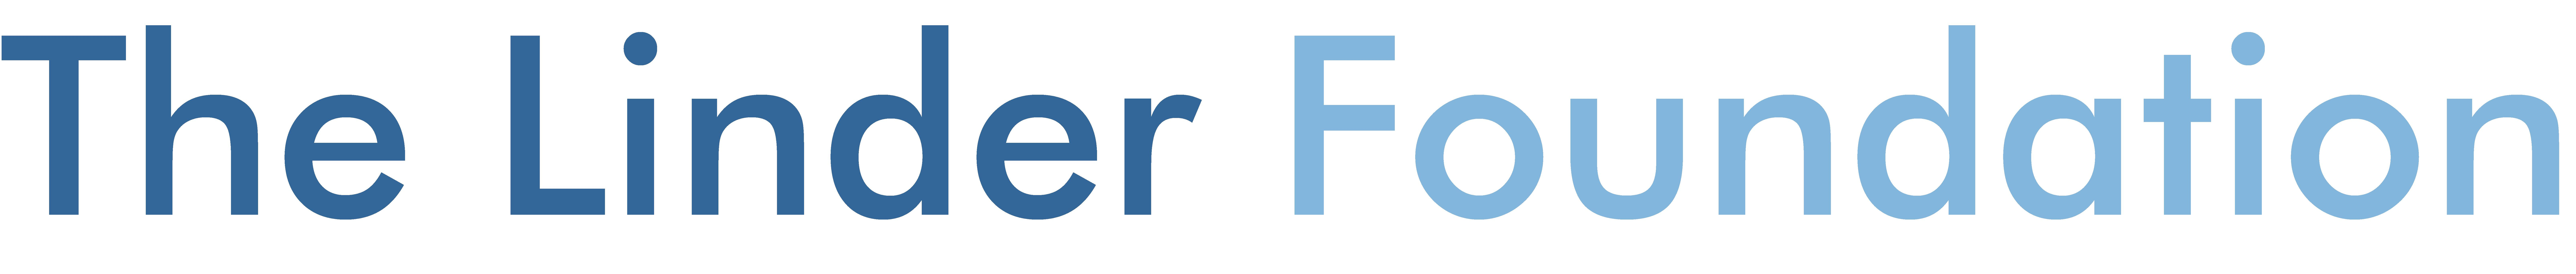 The Linder Foundation